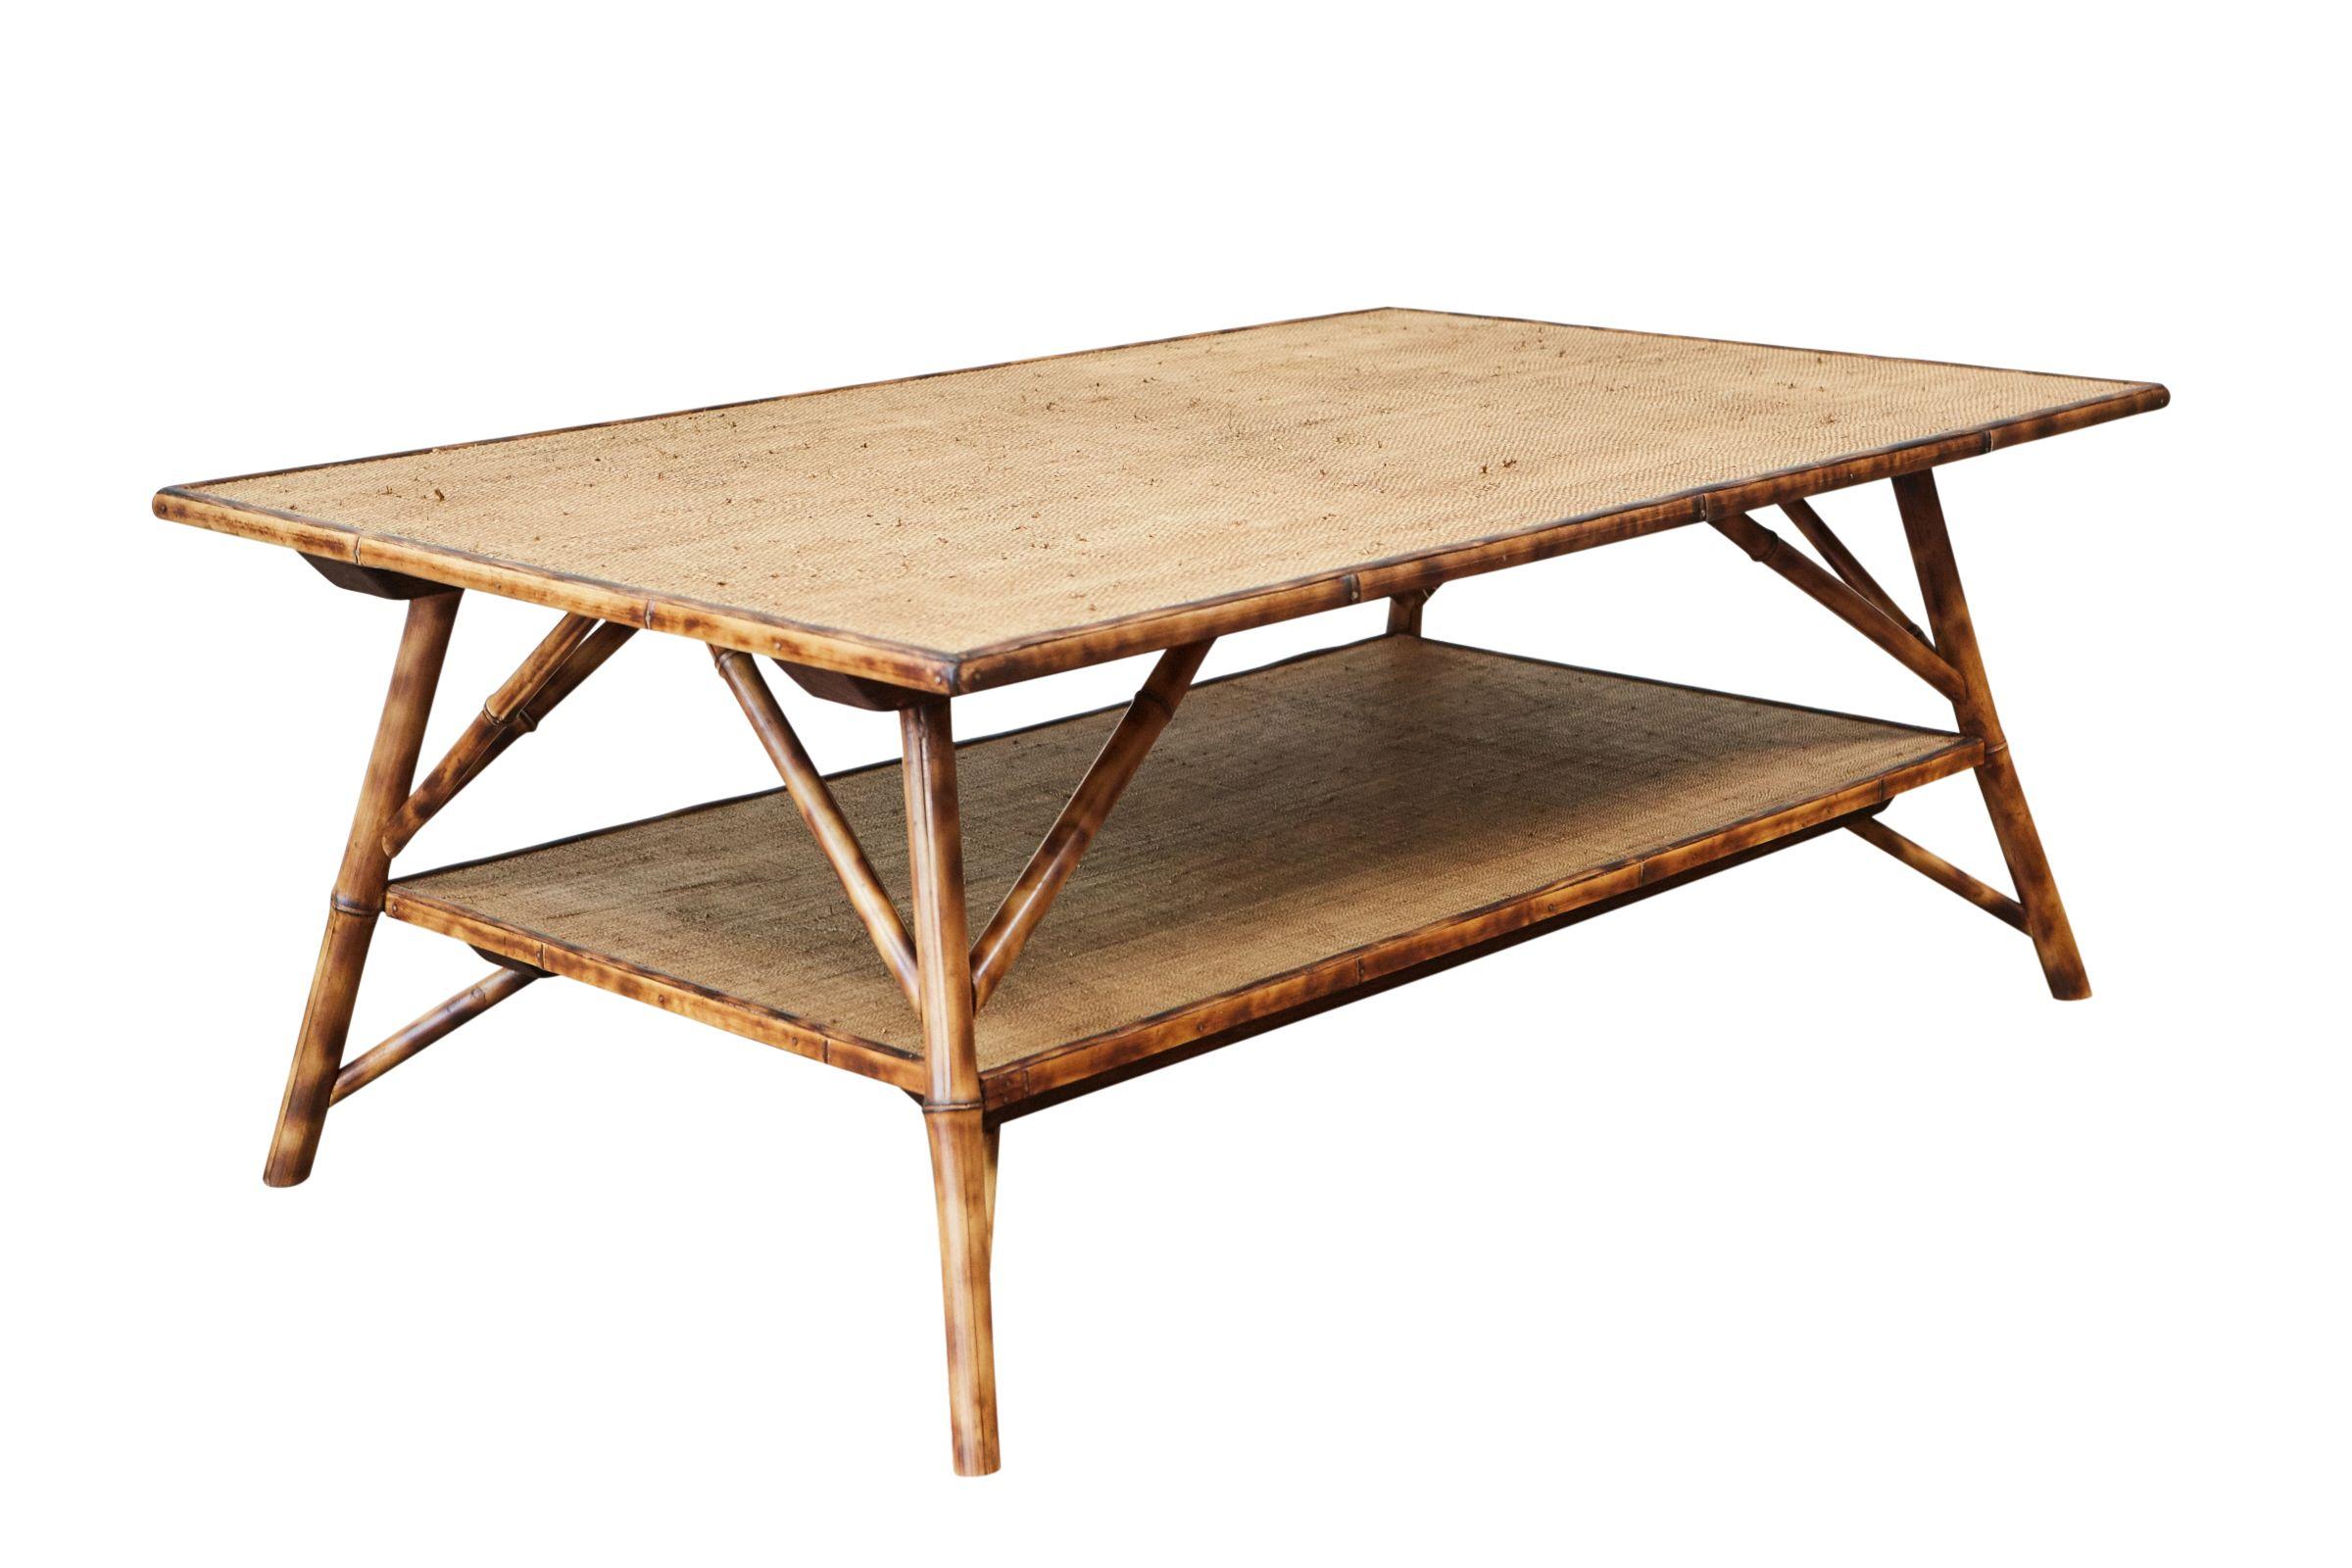 Jw Custom Line Tiger Bamboo Coffee Table Bamboo Coffee Table Coffee Table Table [ 1600 x 2400 Pixel ]